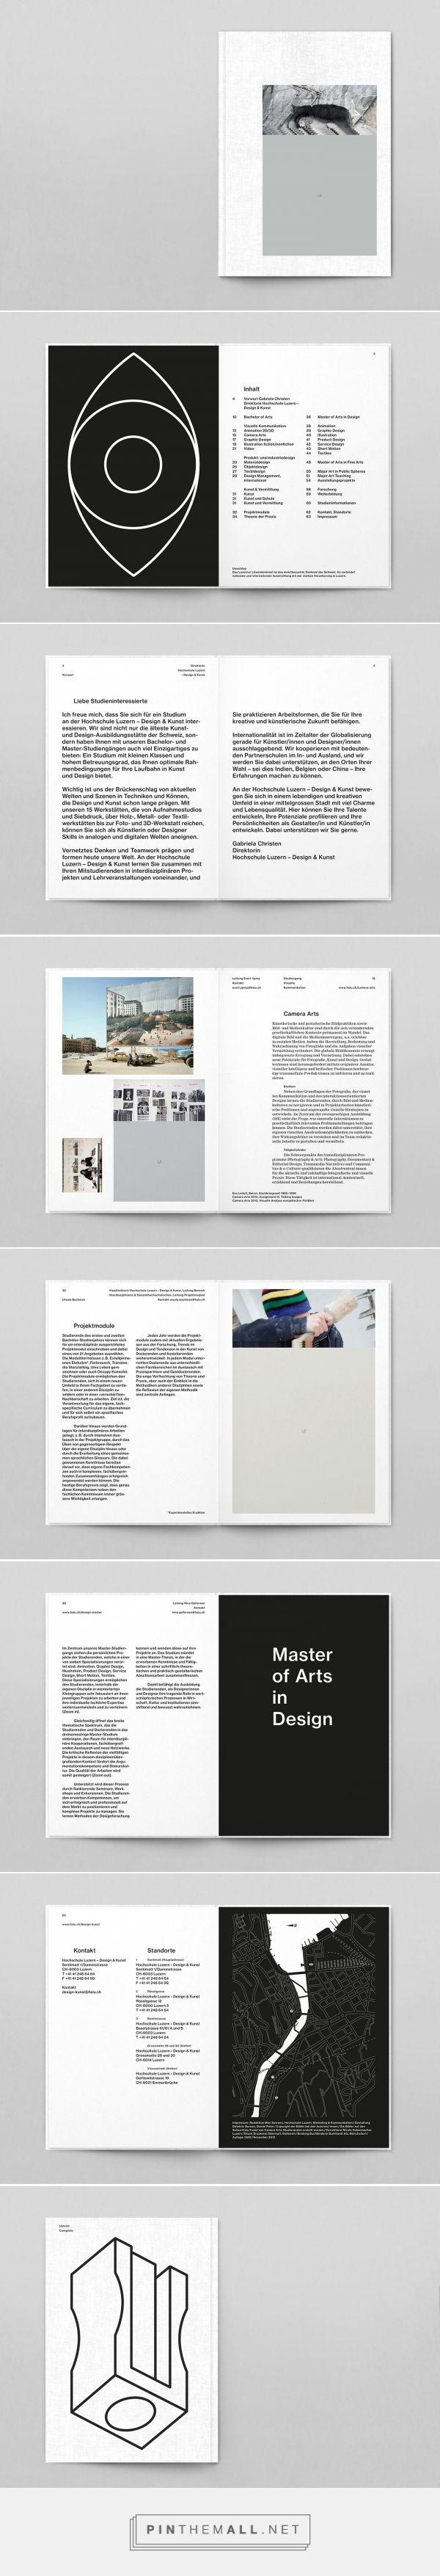 HOCHSCHULE LUZERN – DESIGN UND KUNST Studienangebot on Behance... - a grouped images picture - Pin Them All